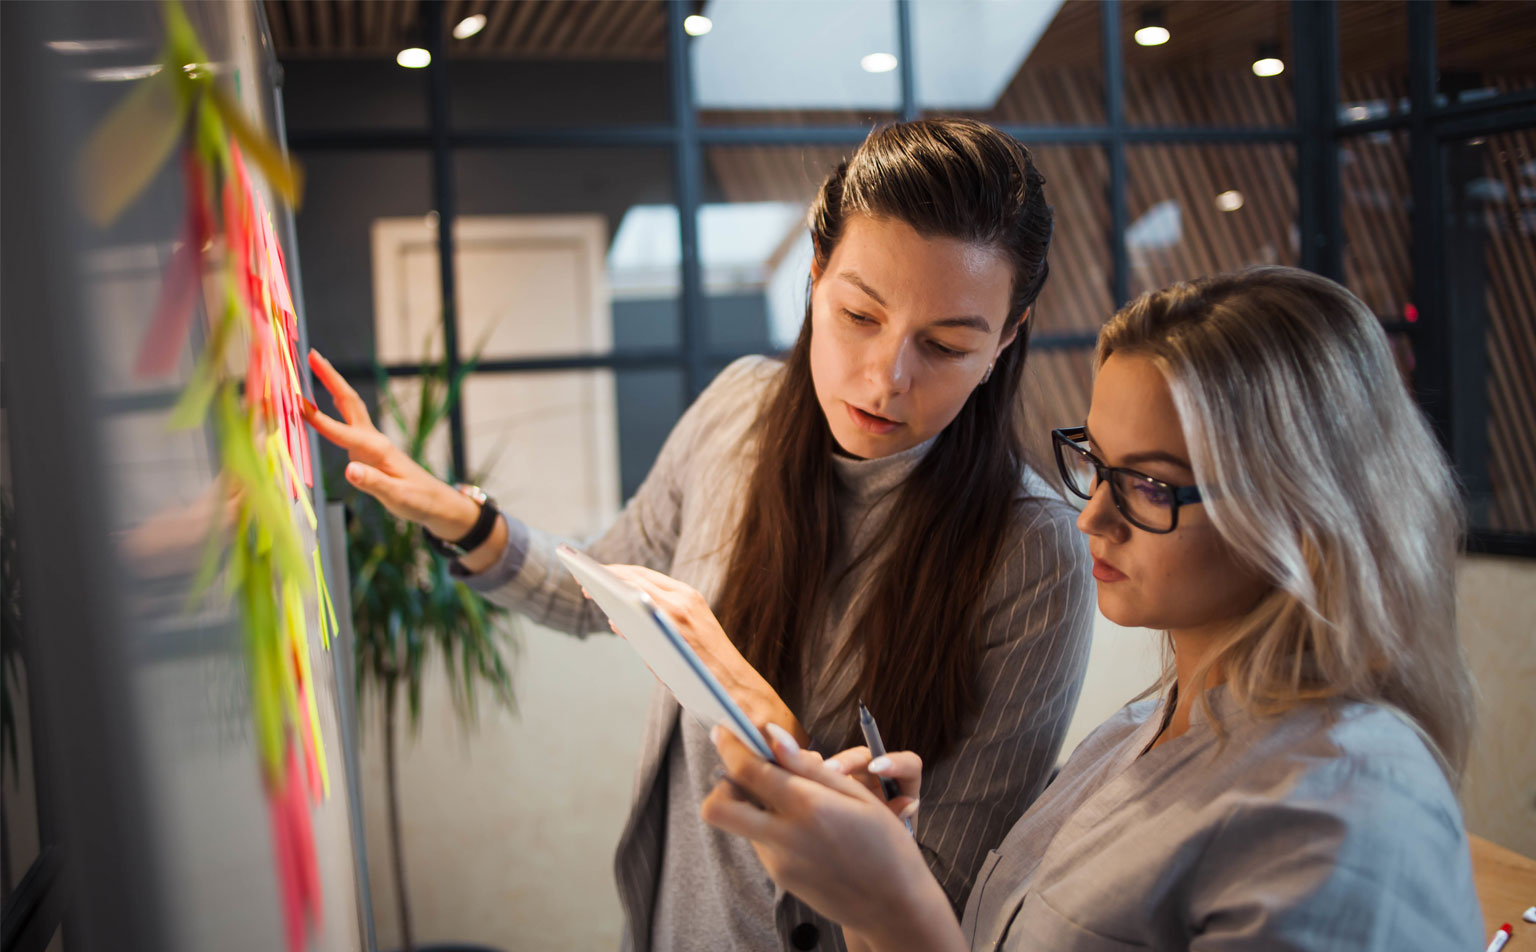 Focused Agile Audit Planning Using Analytics